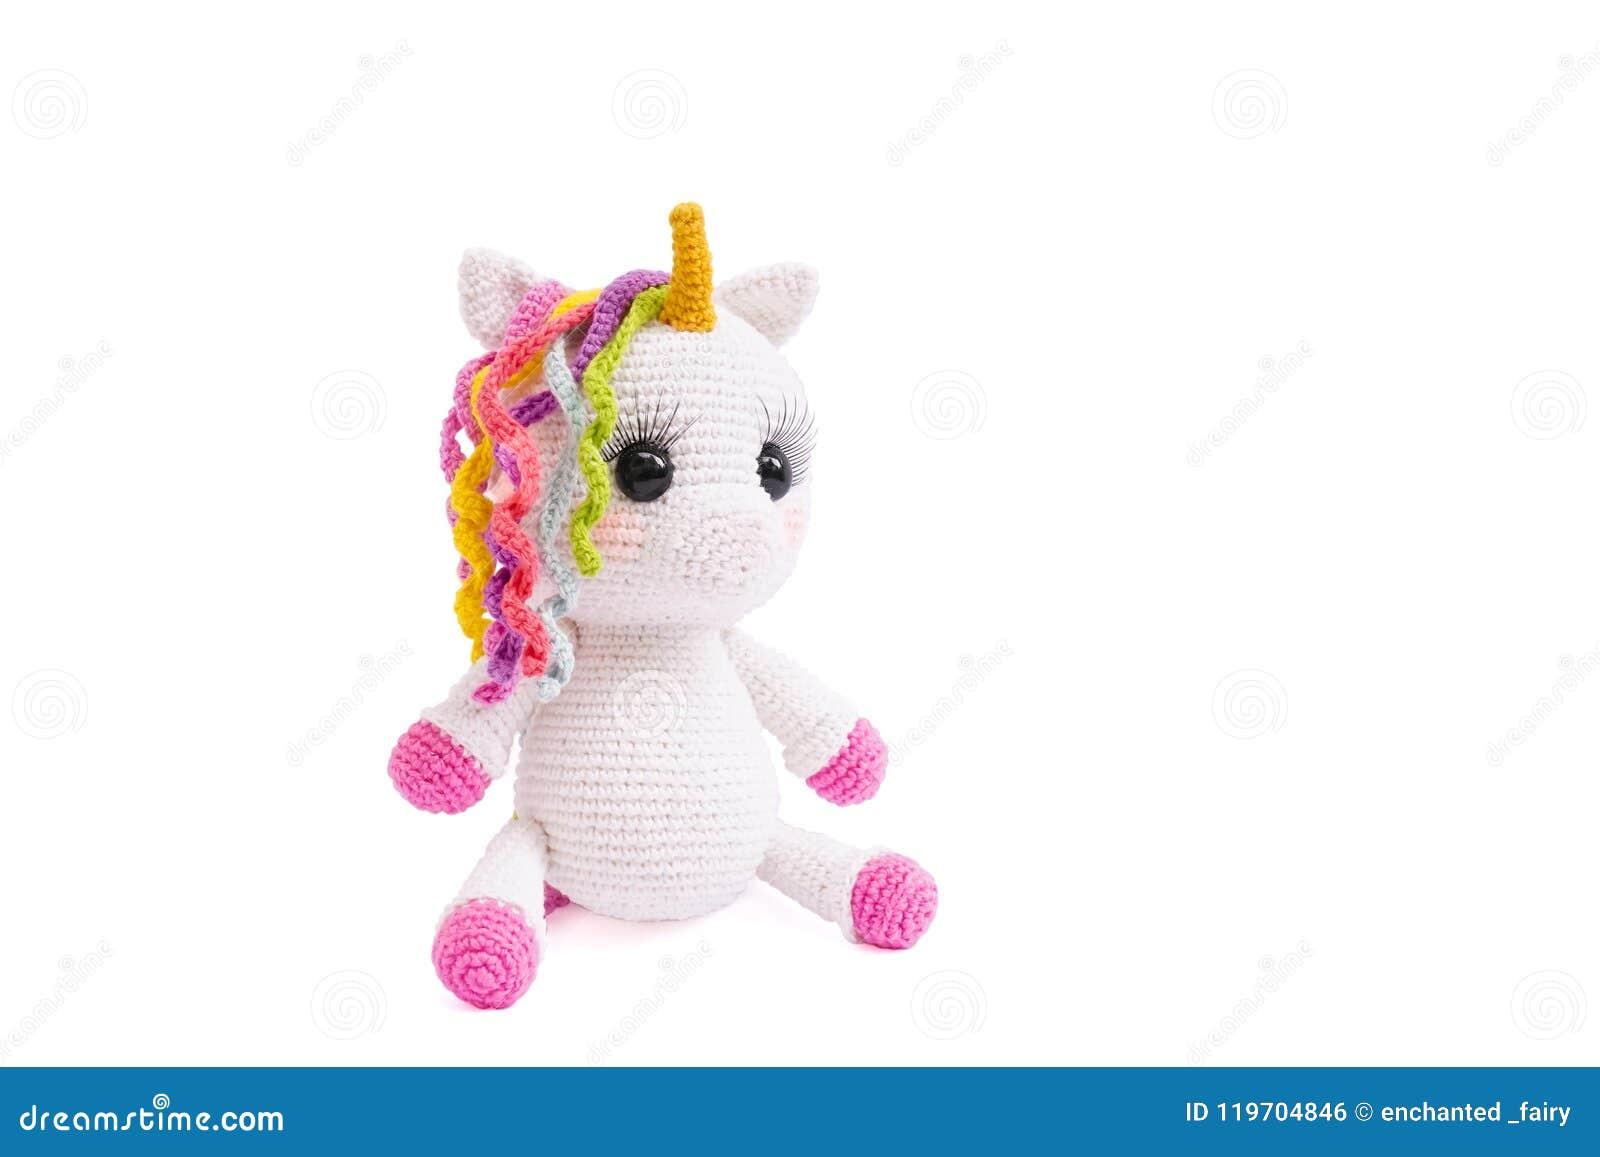 Doll Crochet Pattern, Unicorn Girl Doll, Amigurumi Doll, Unicorn ... | 957x1300